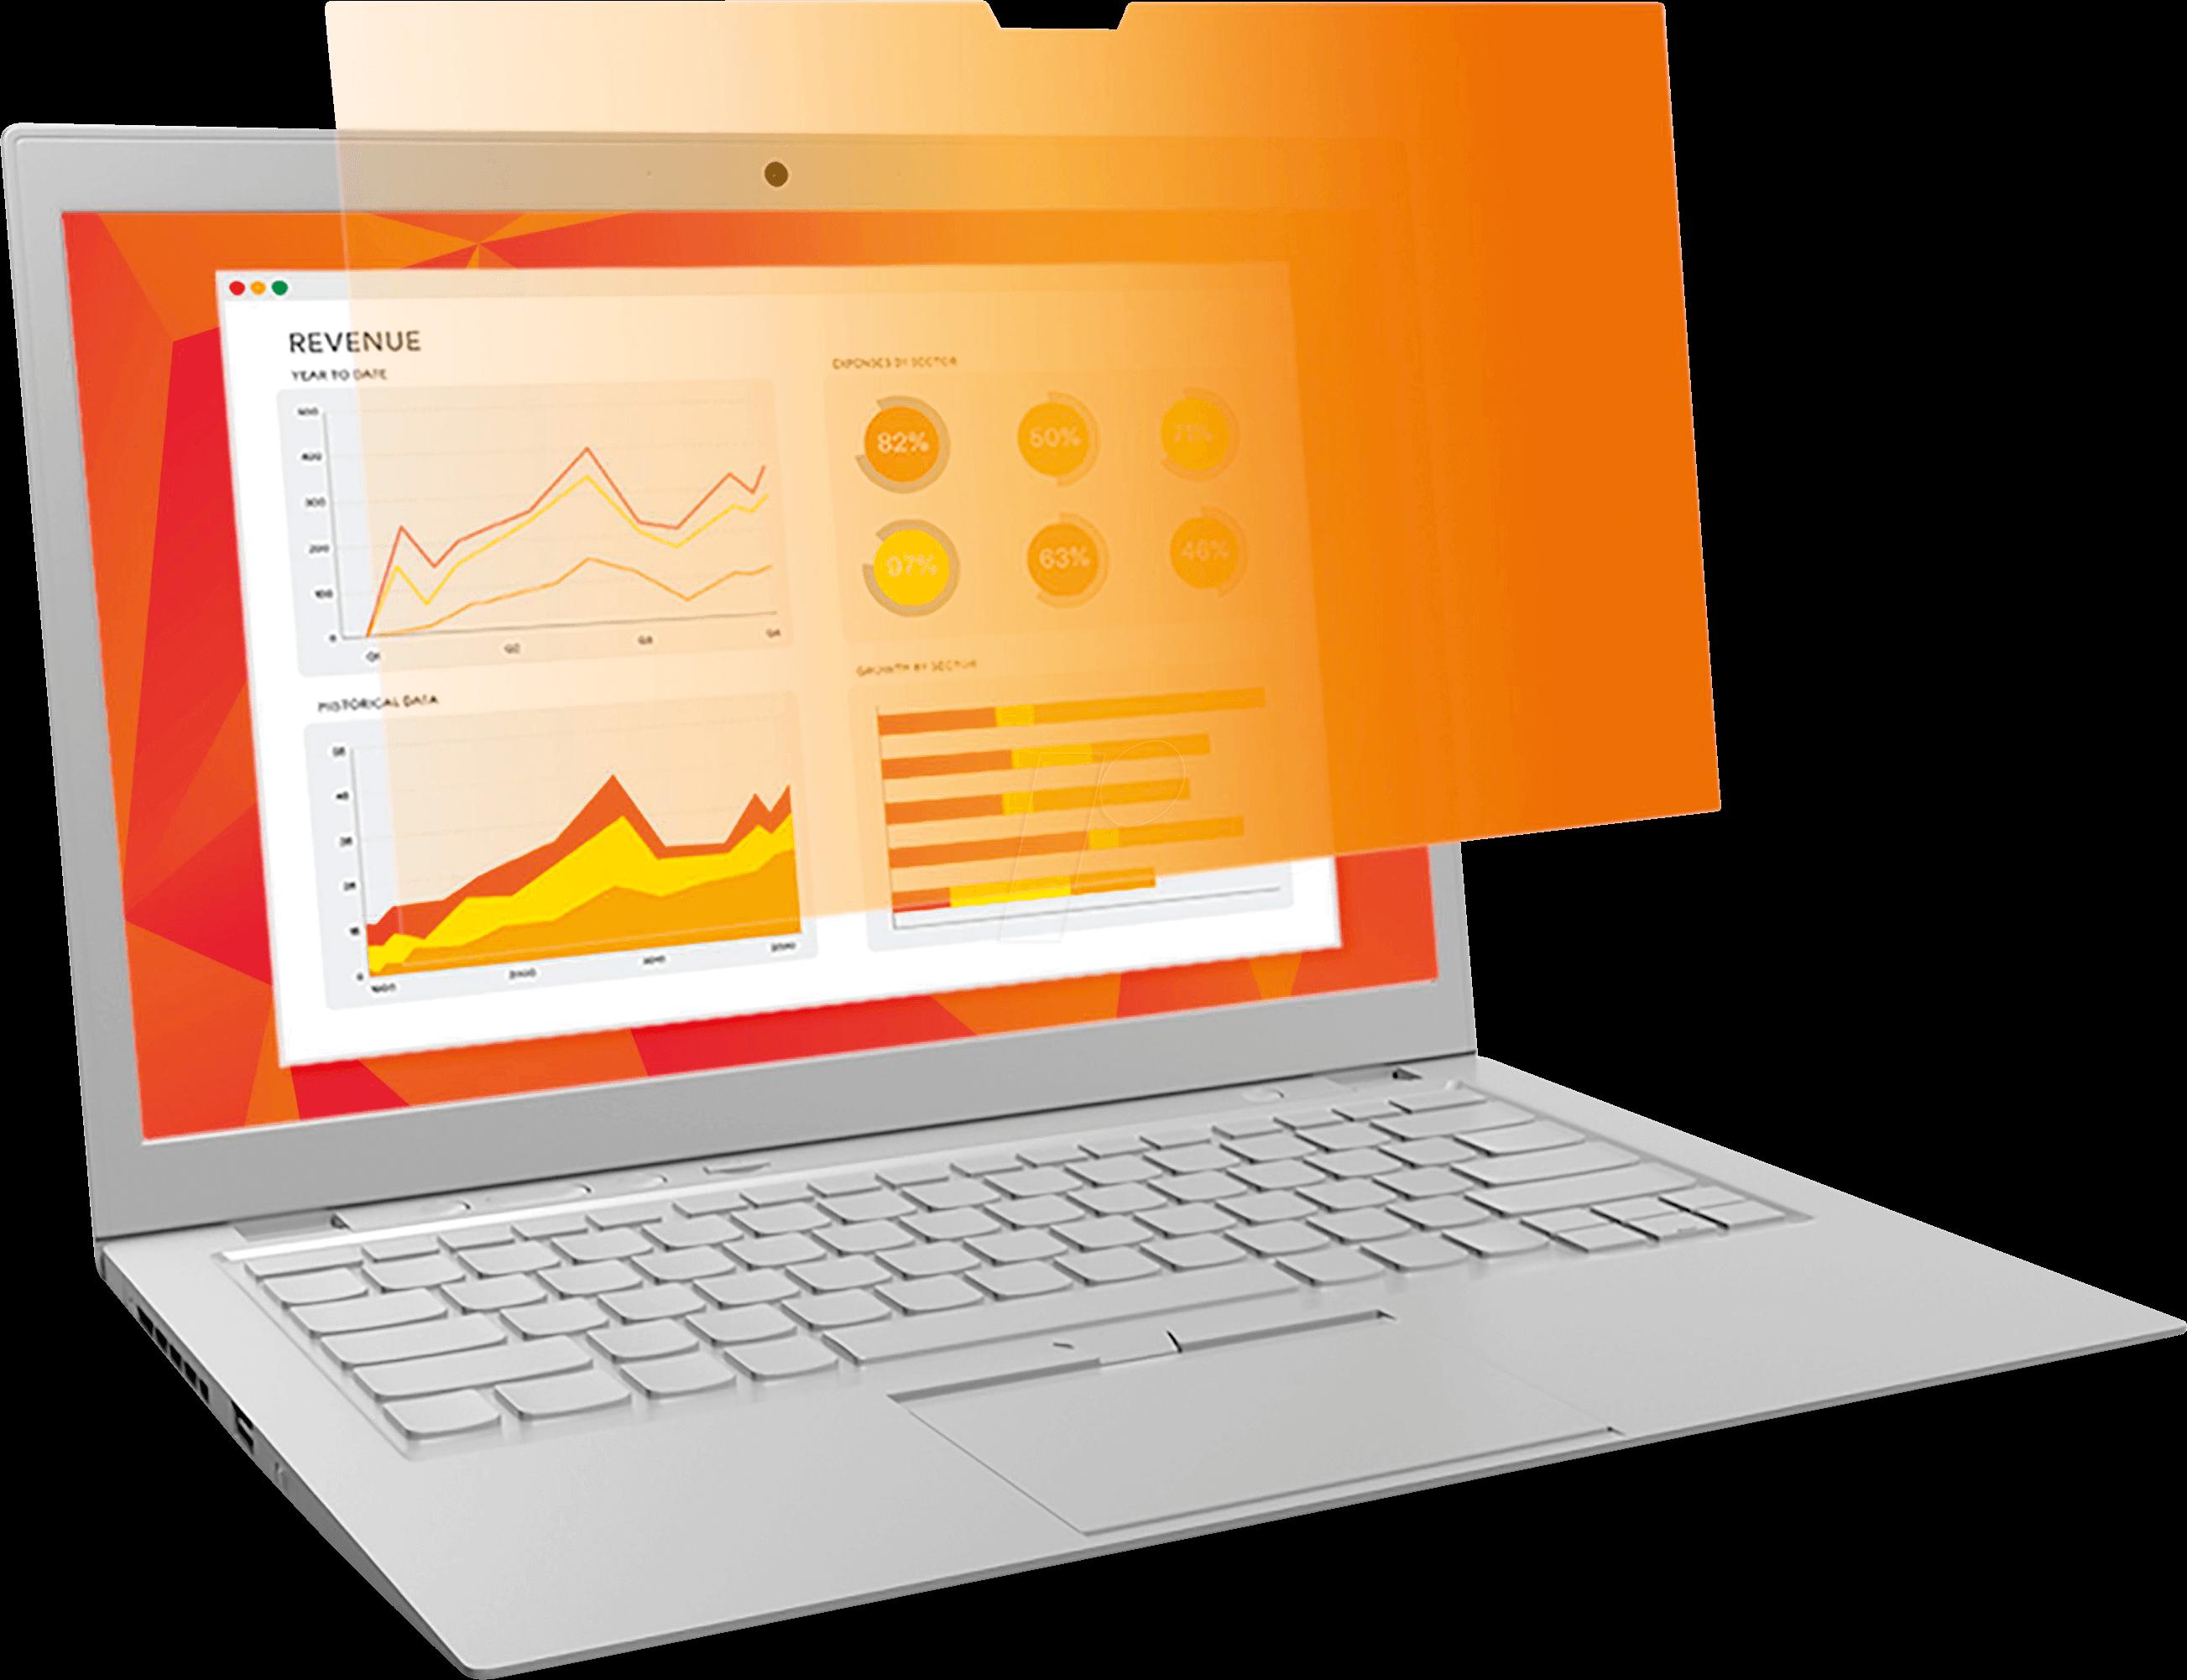 3M GF125W9E - Blickschutzfilter, 12,5 Laptop, 16:9, gold